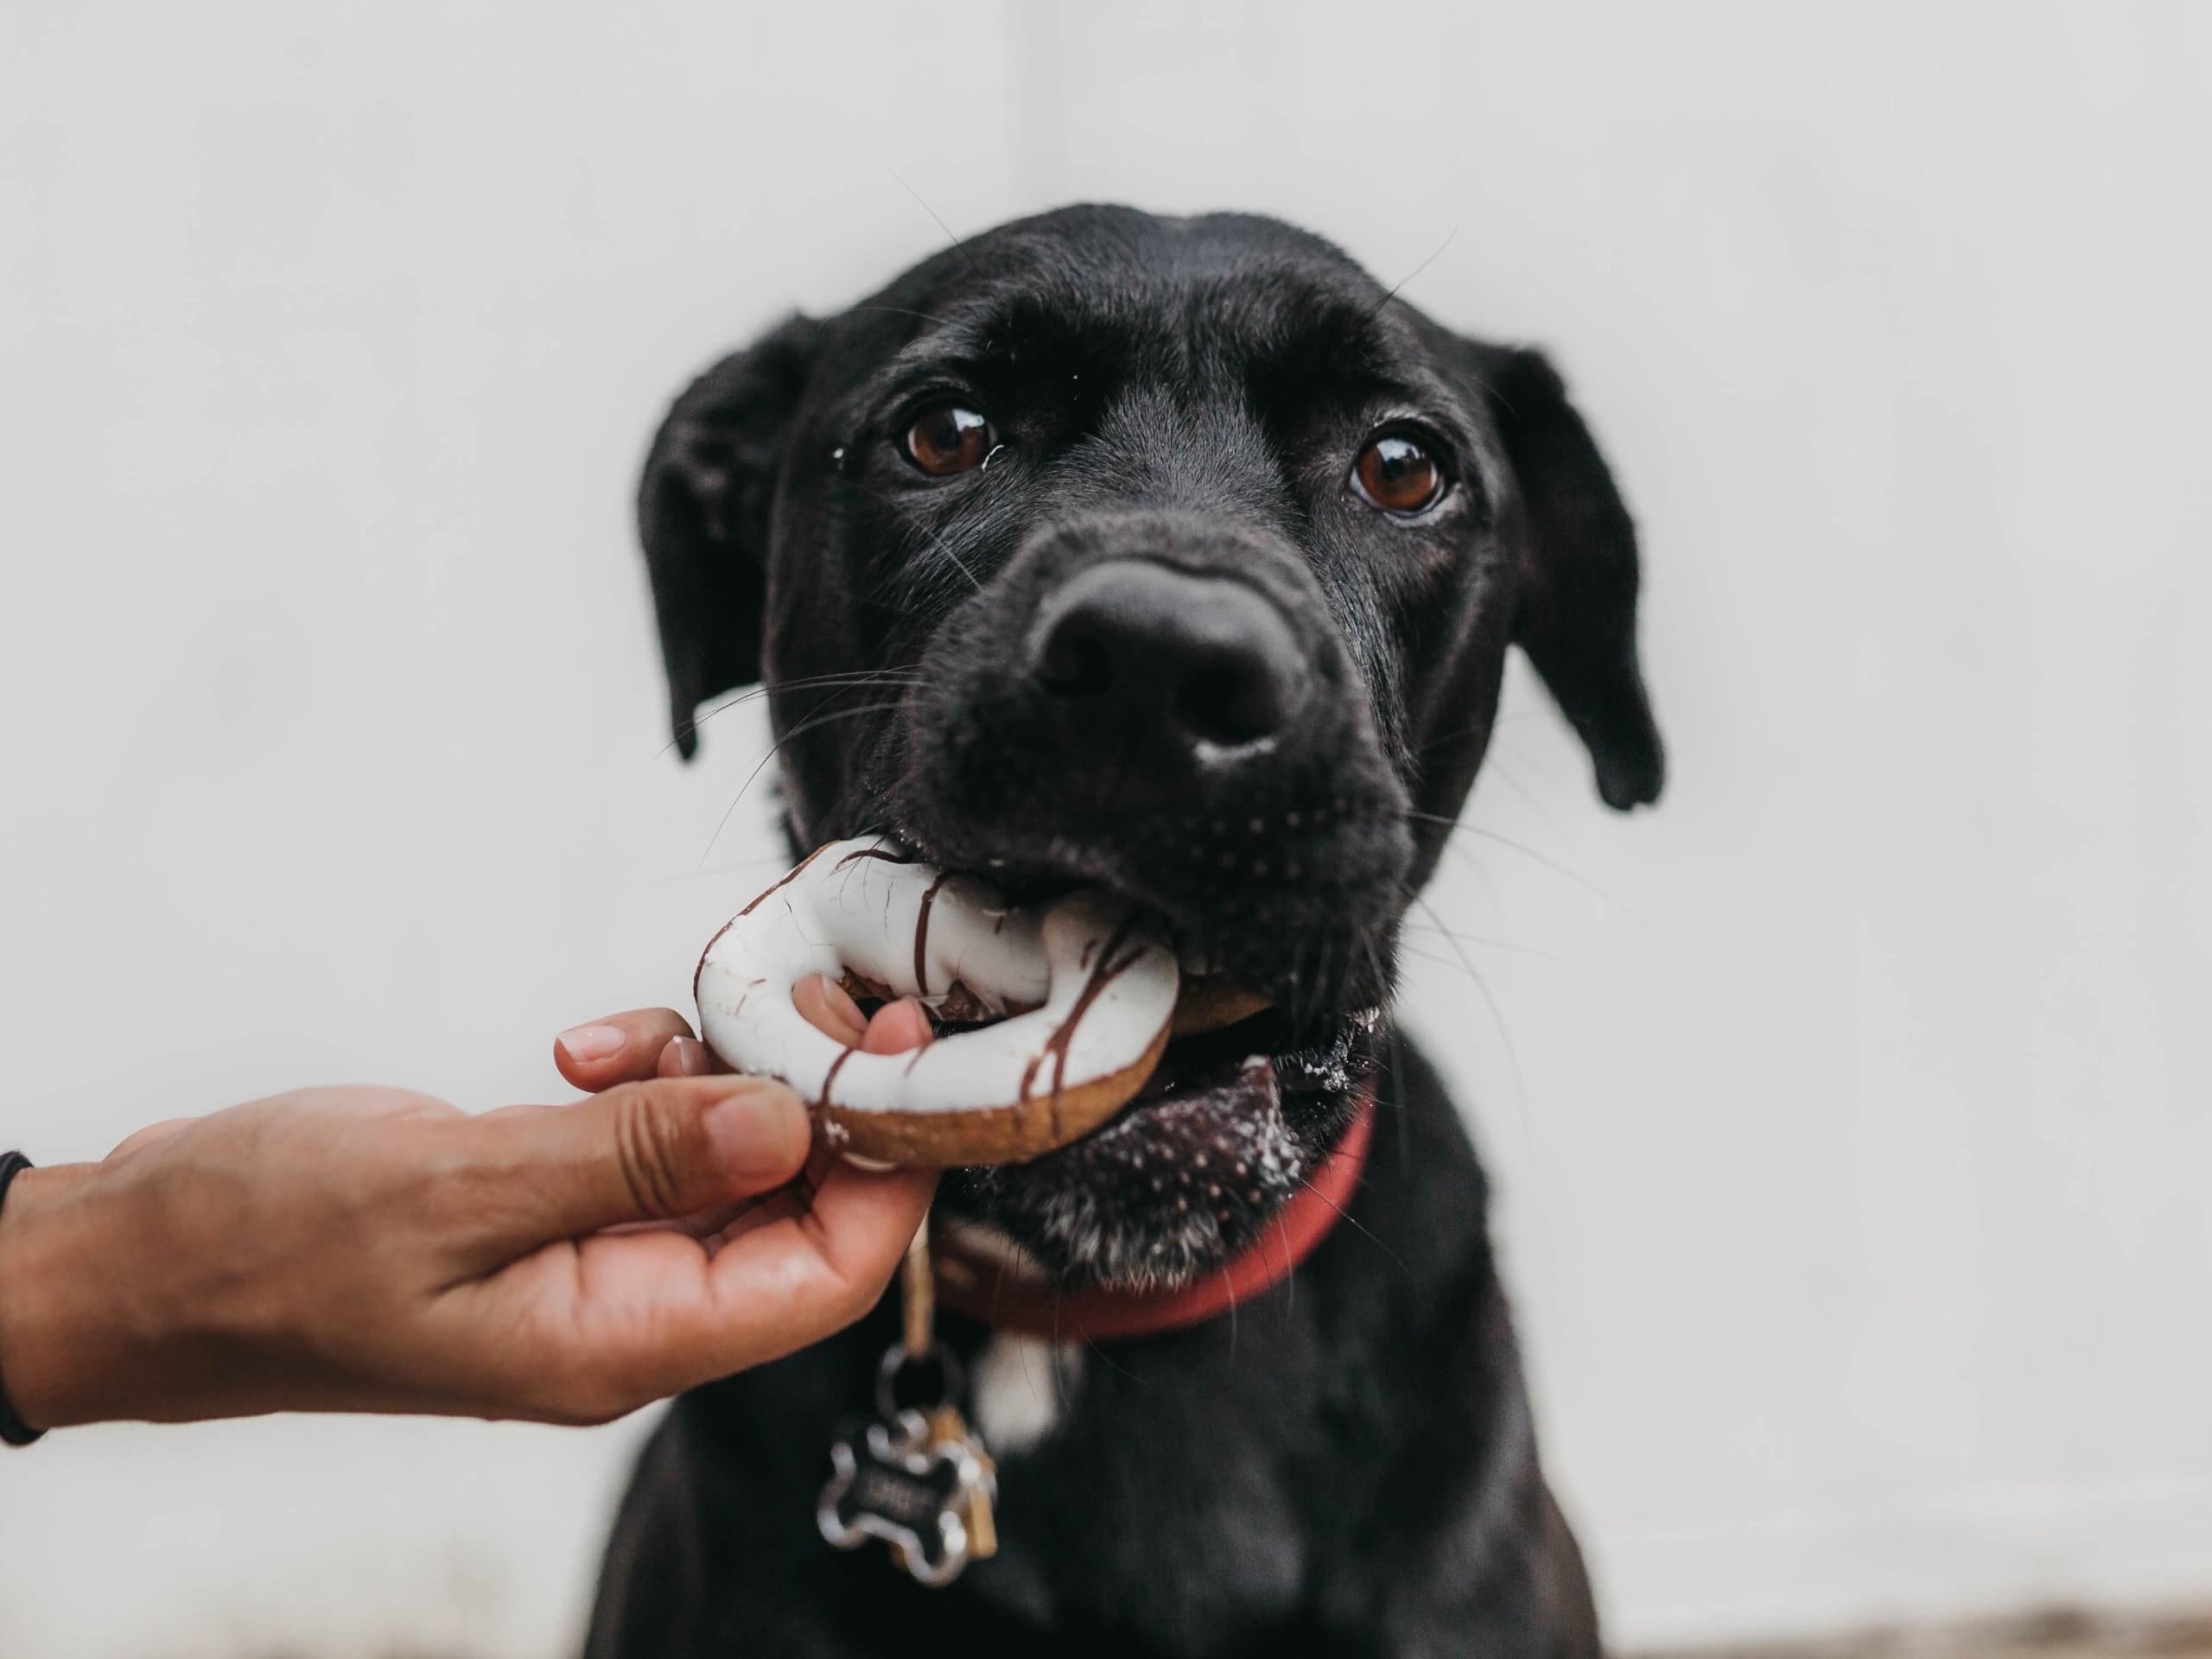 Black dog eating a dog friendly donut